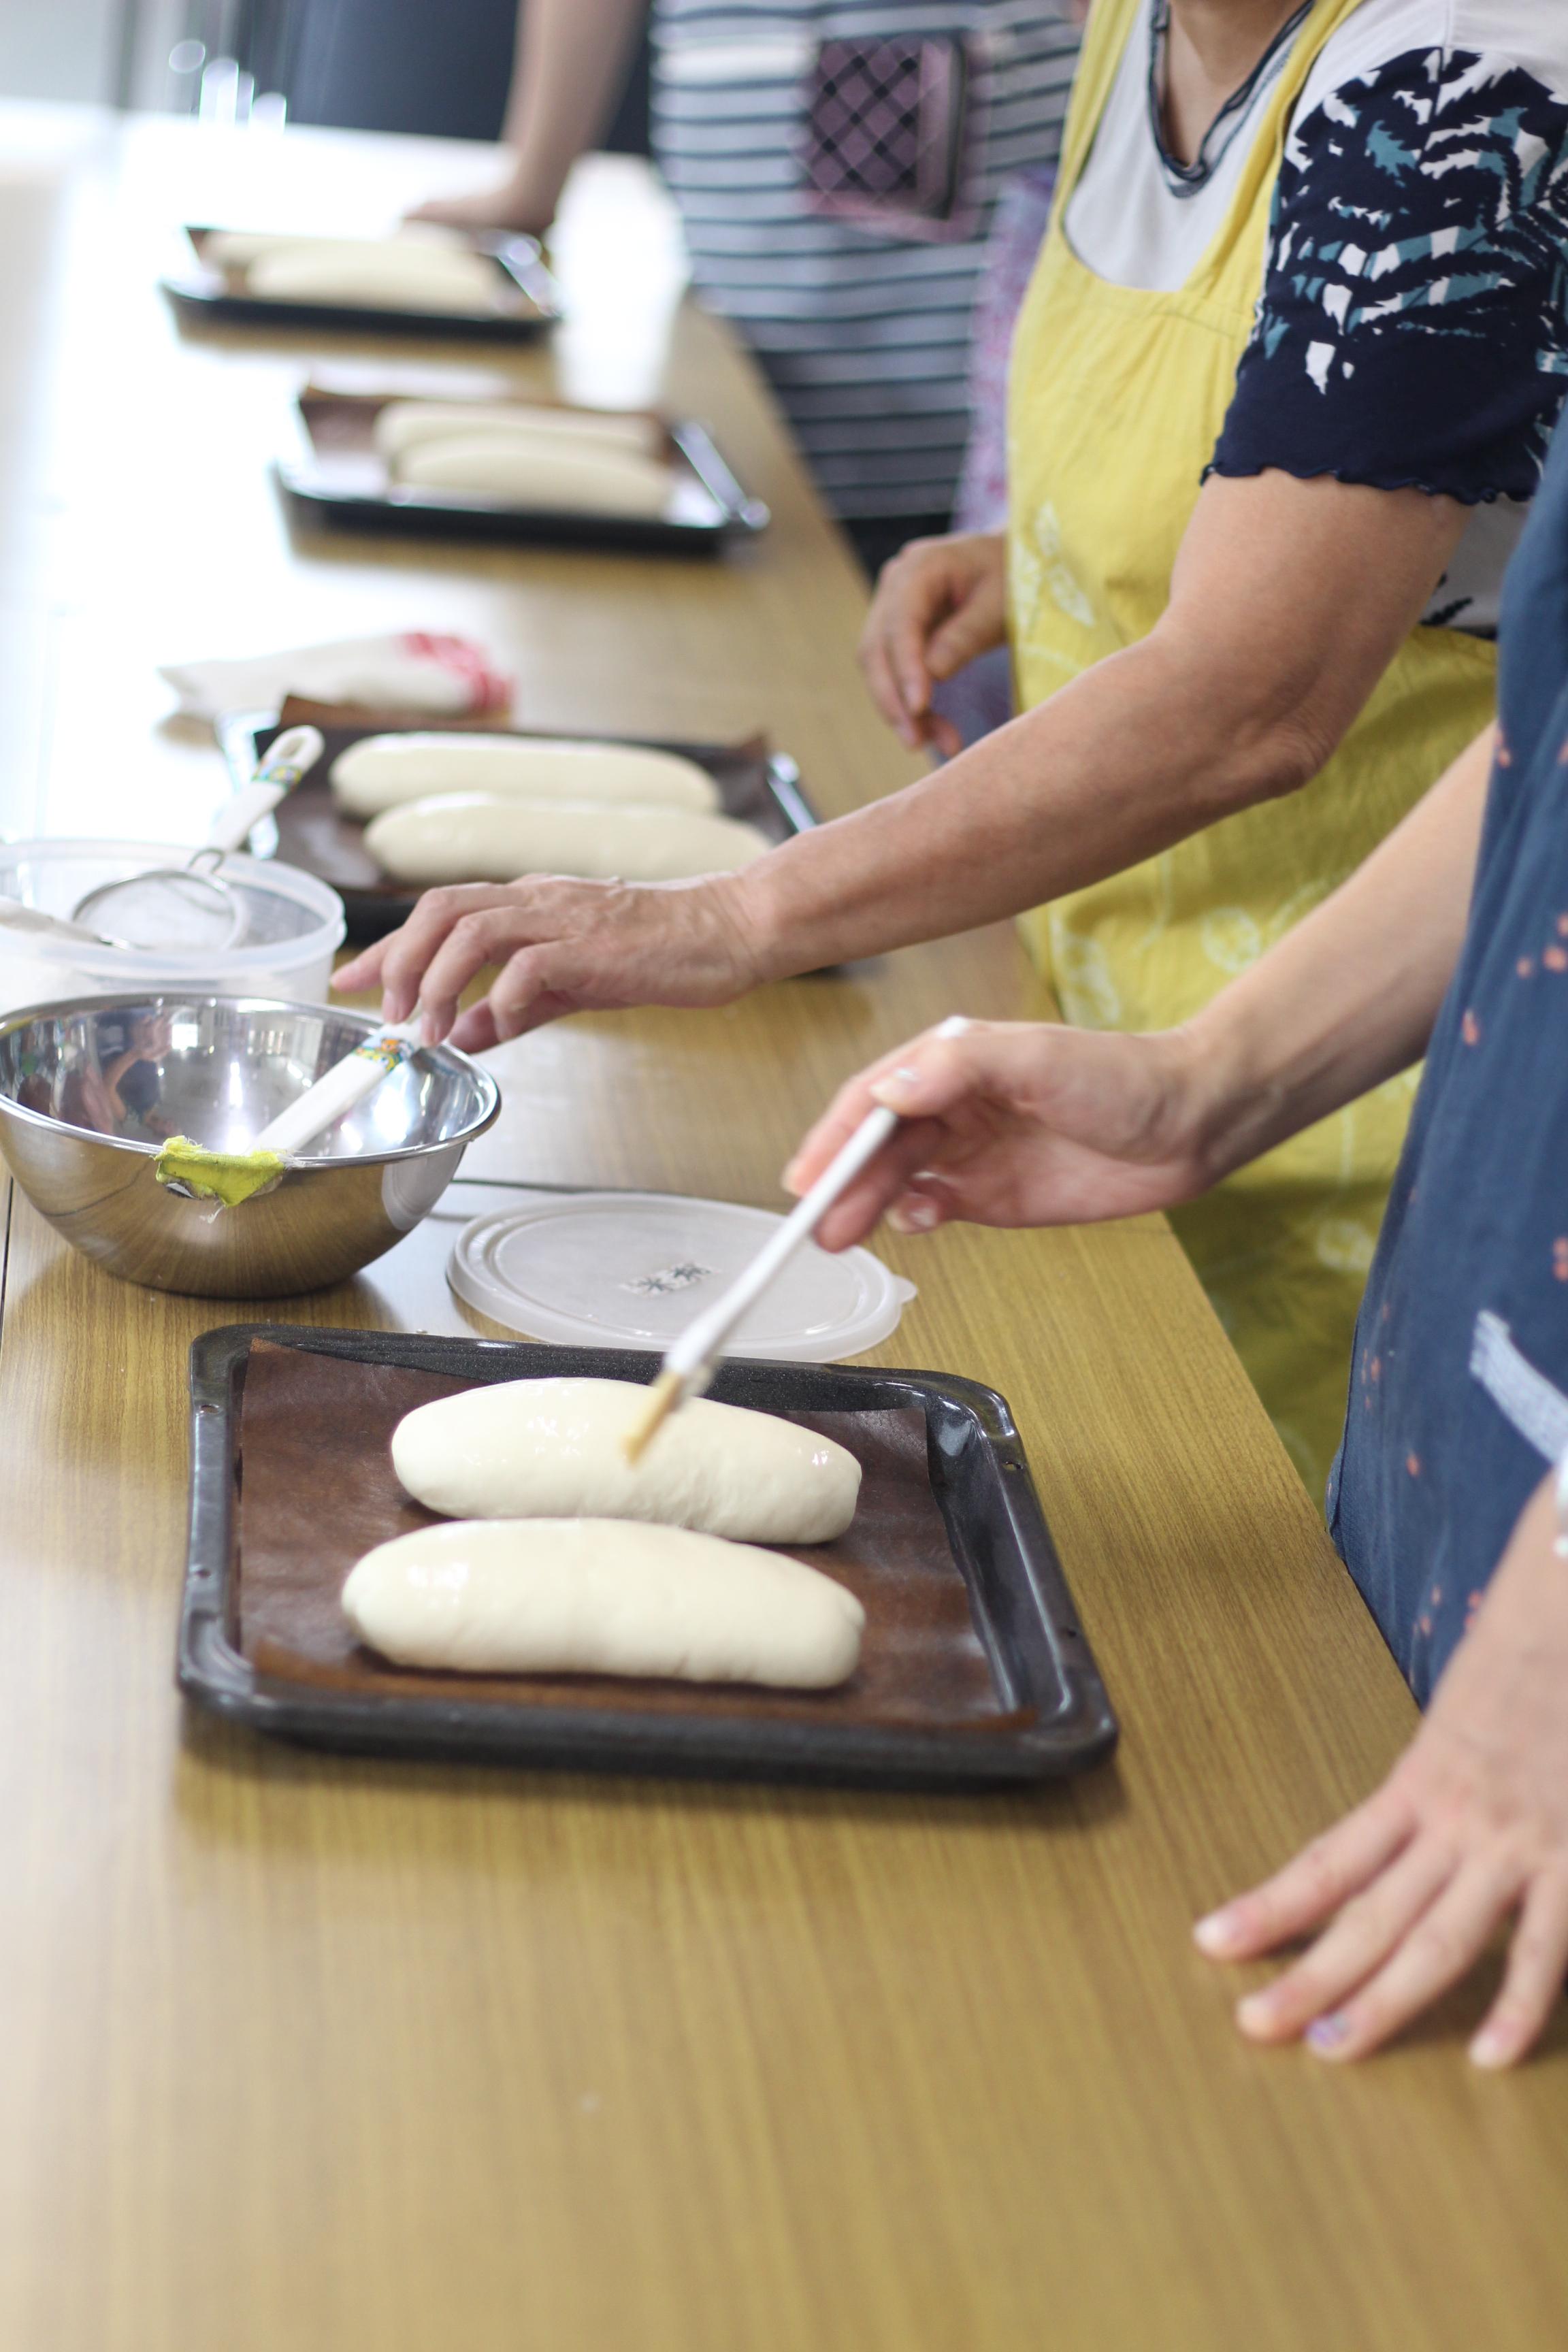 a-ta-sante糖質制限パン料理教室、阿倍野区西田辺。会館でのレッスン、セミハードブレッド。